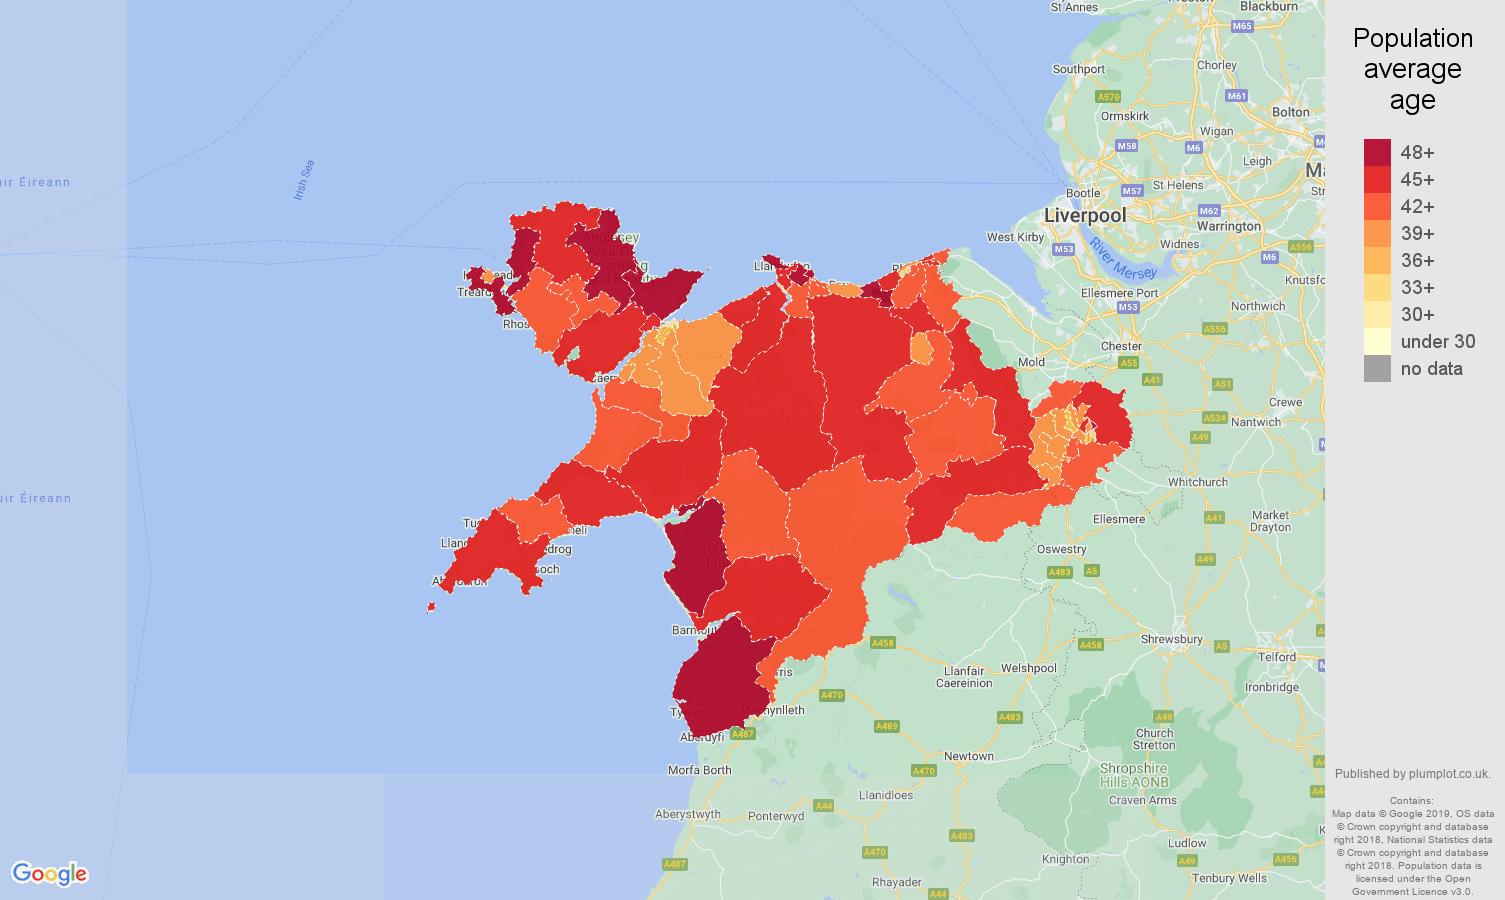 Llandudno population average age map